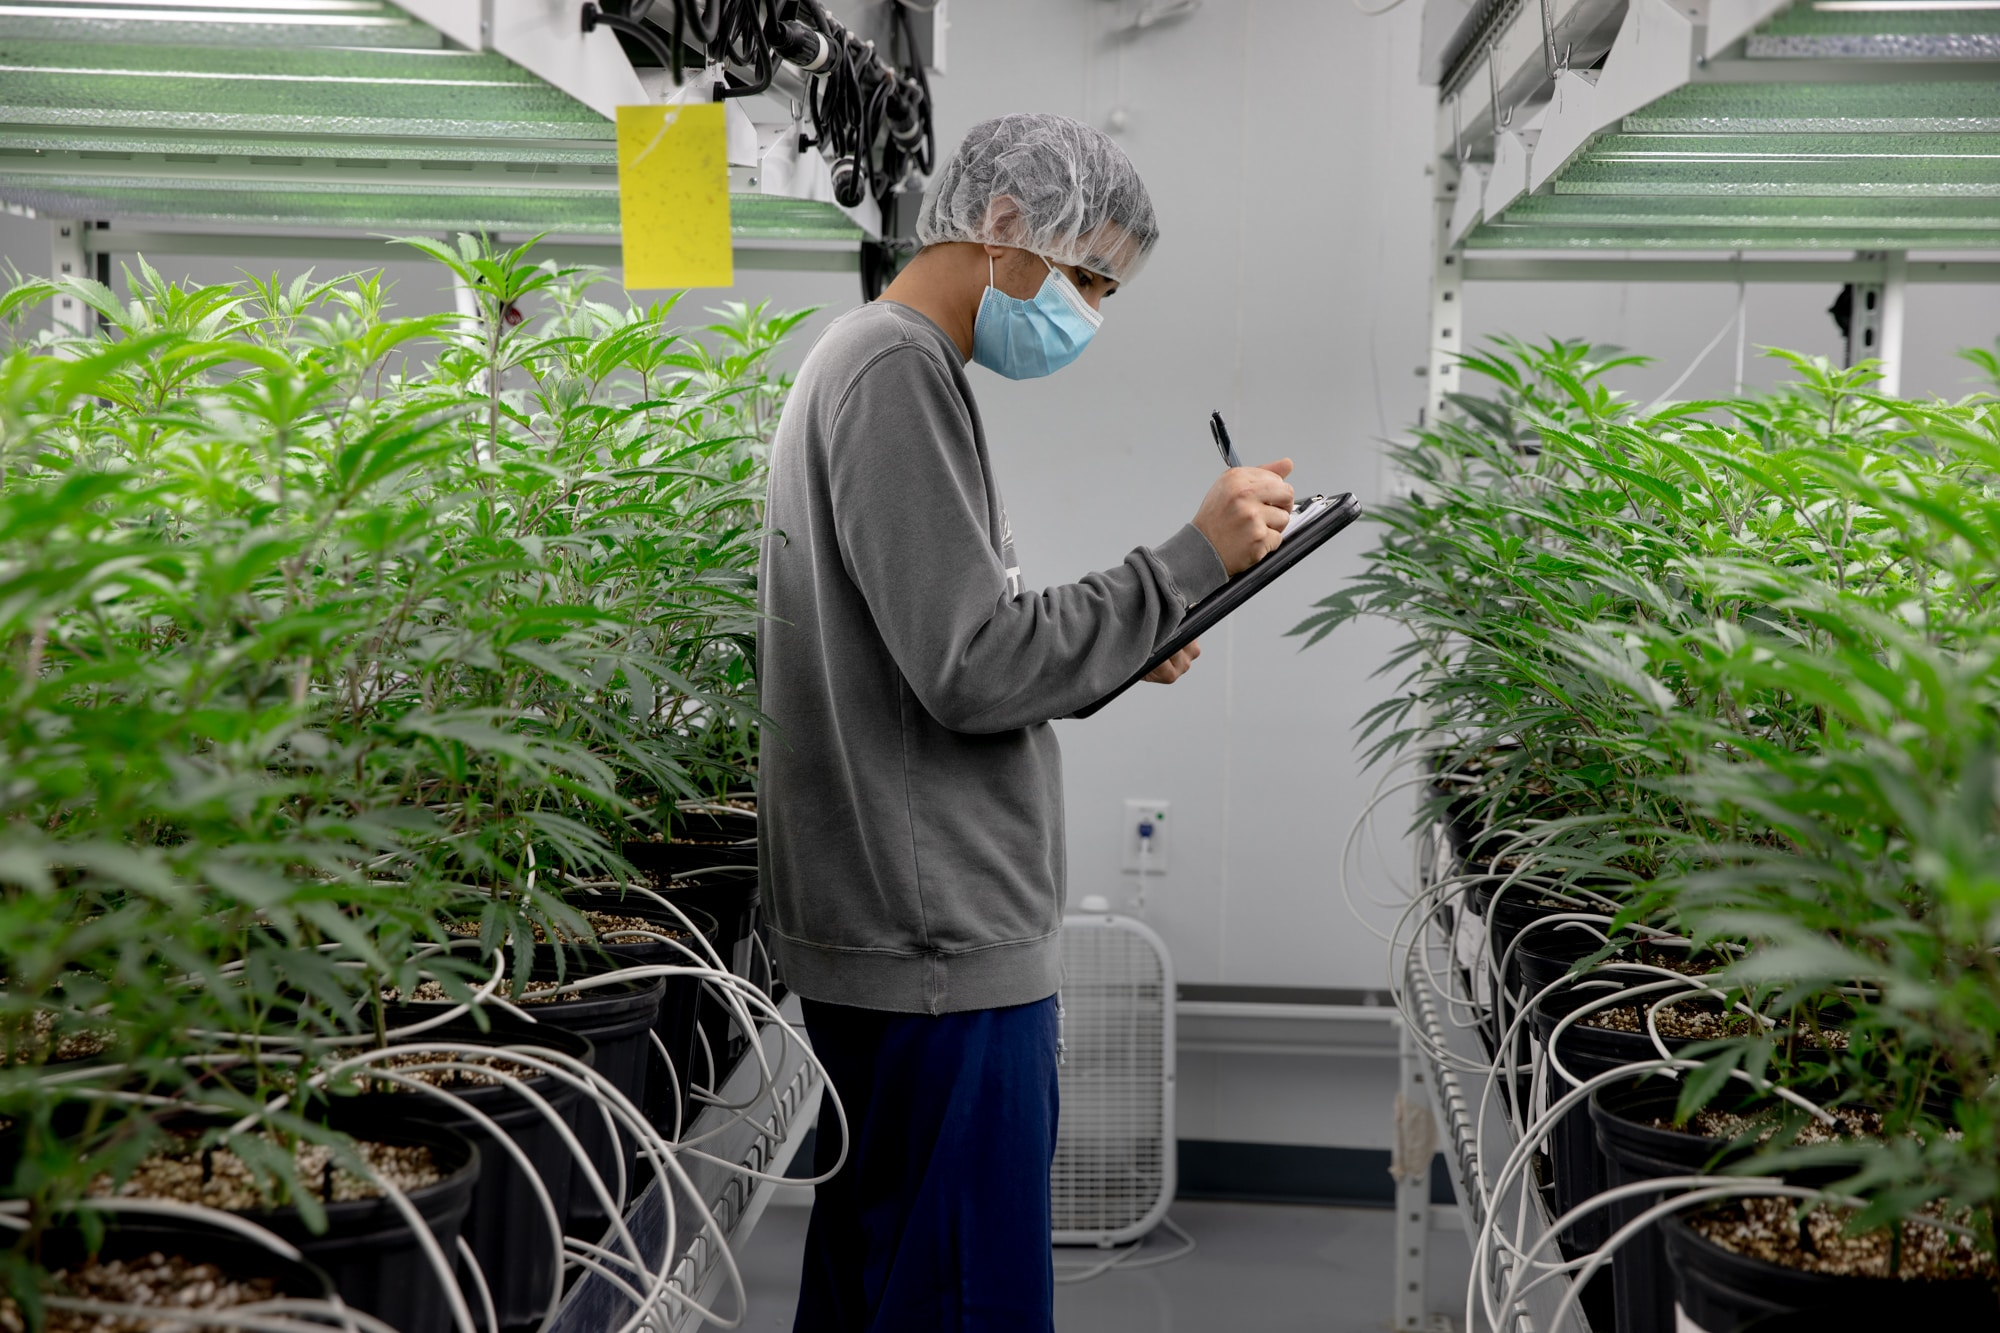 Ritter pledges passage of marijuana legalization bill in special session